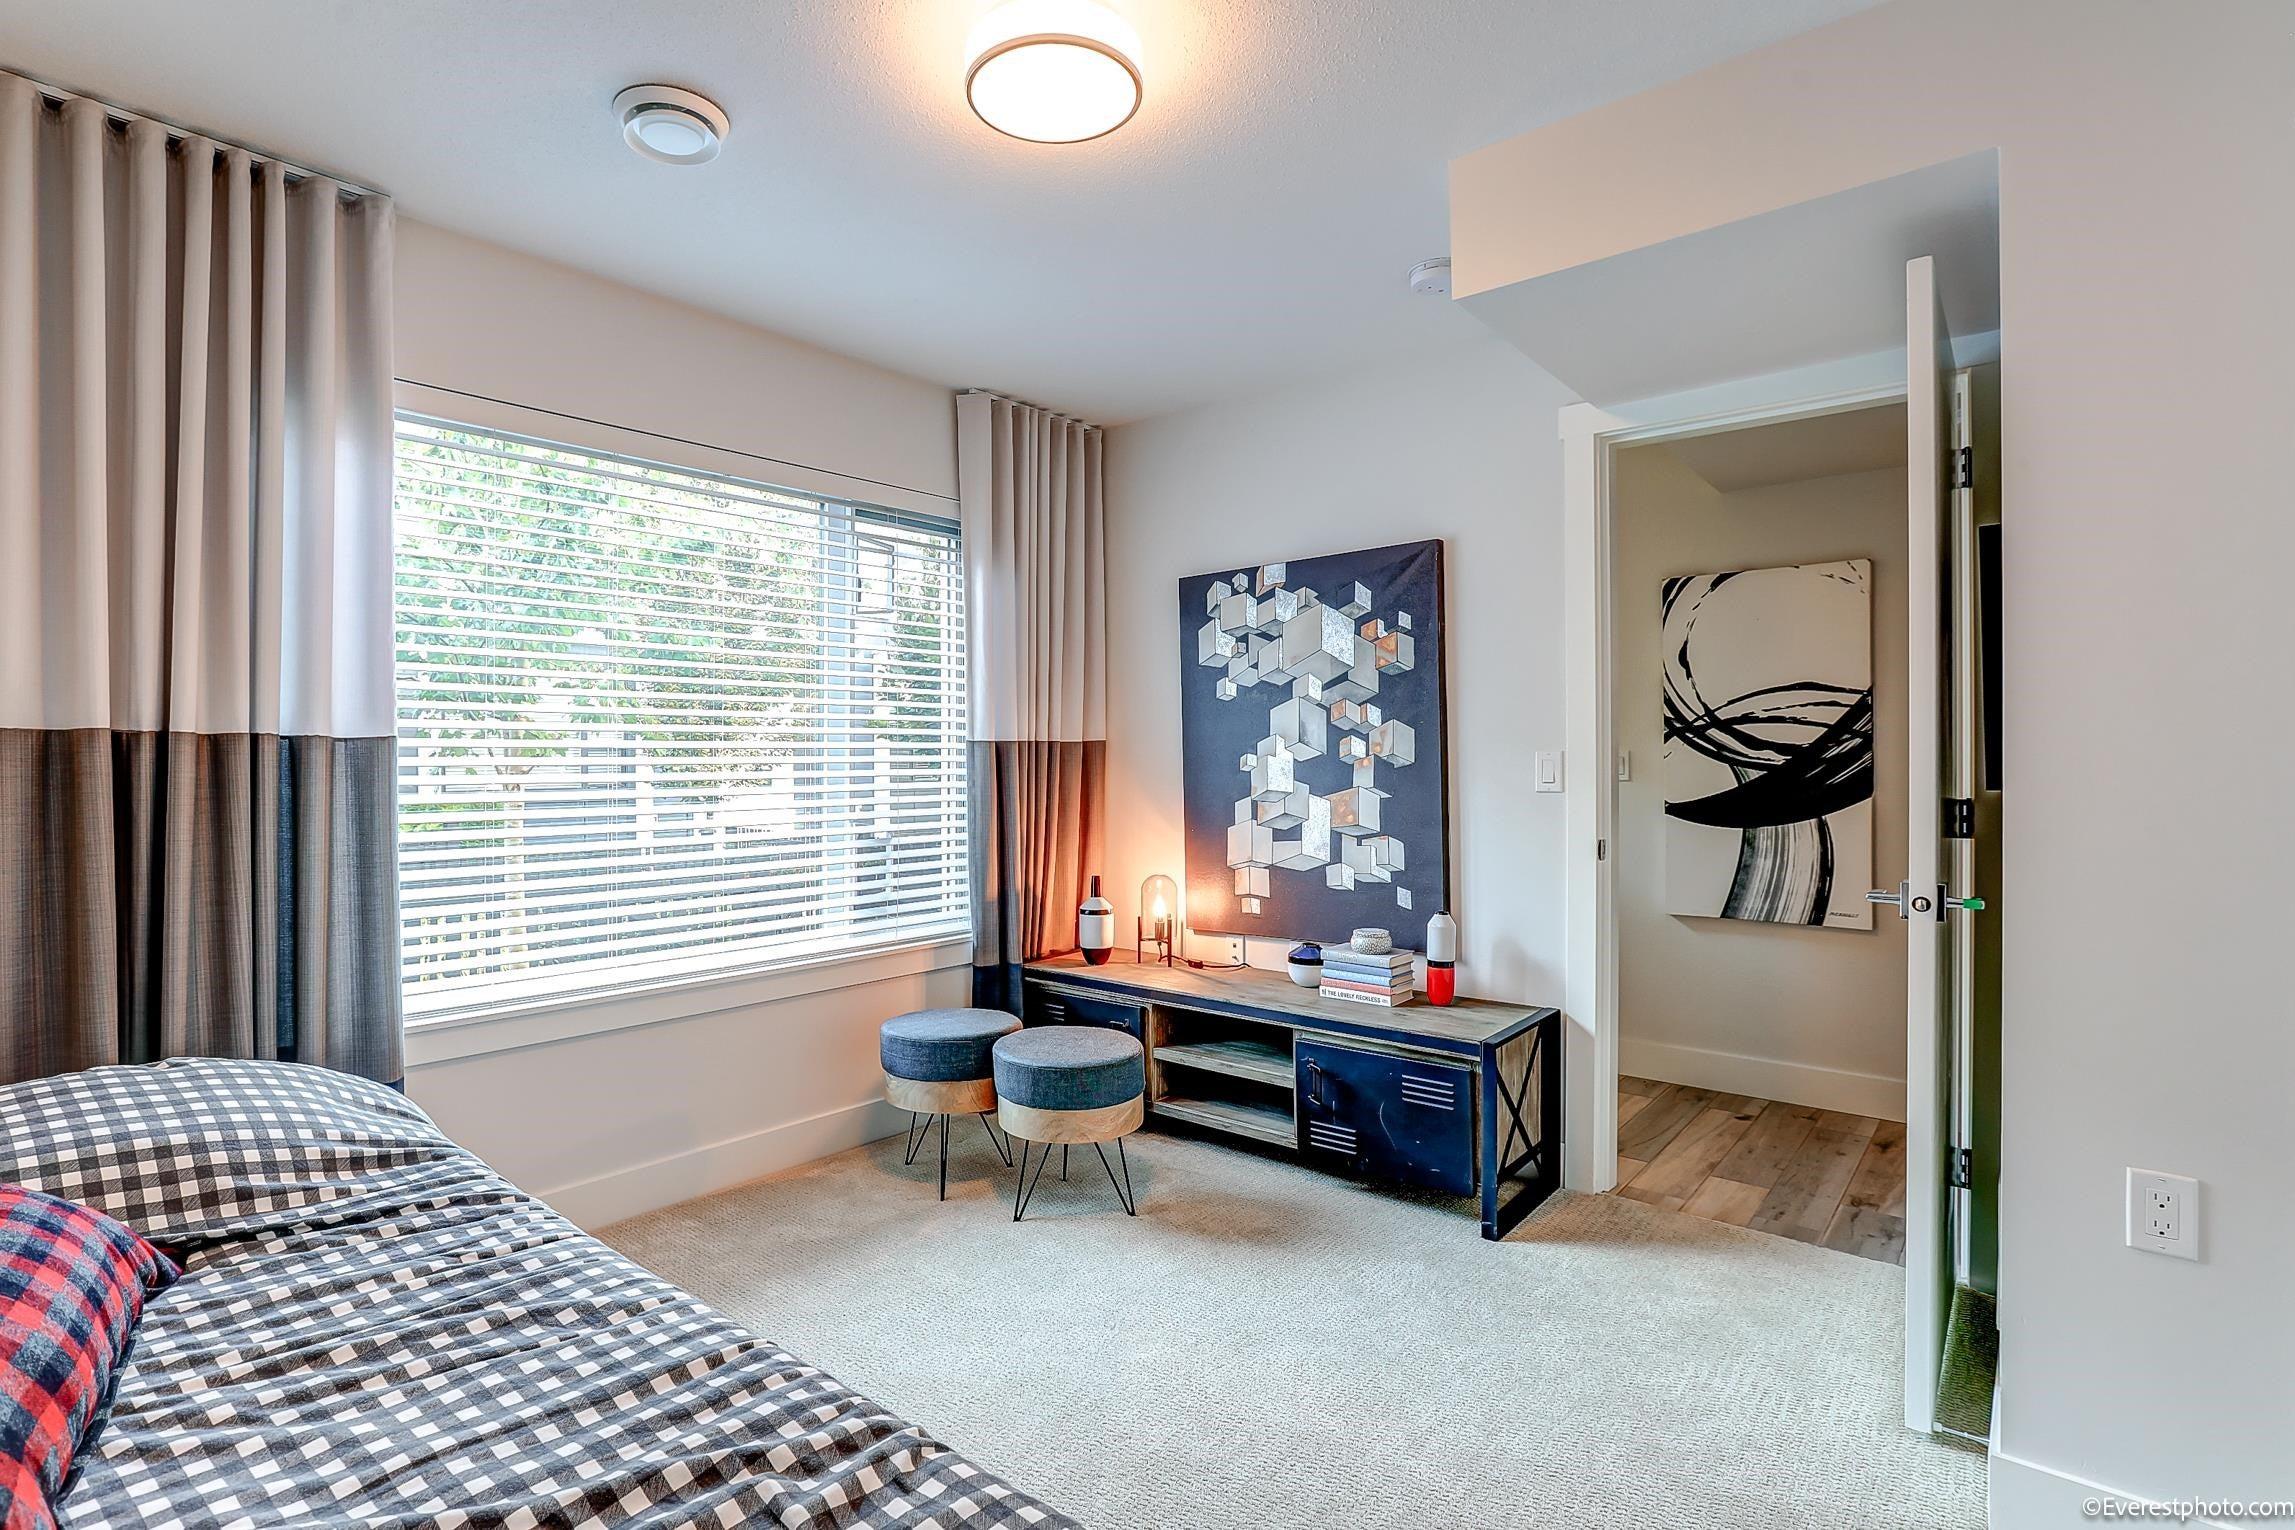 186 2277 OAK MEADOWS DRIVE - Grandview Surrey Townhouse for sale, 3 Bedrooms (R2624950) - #5